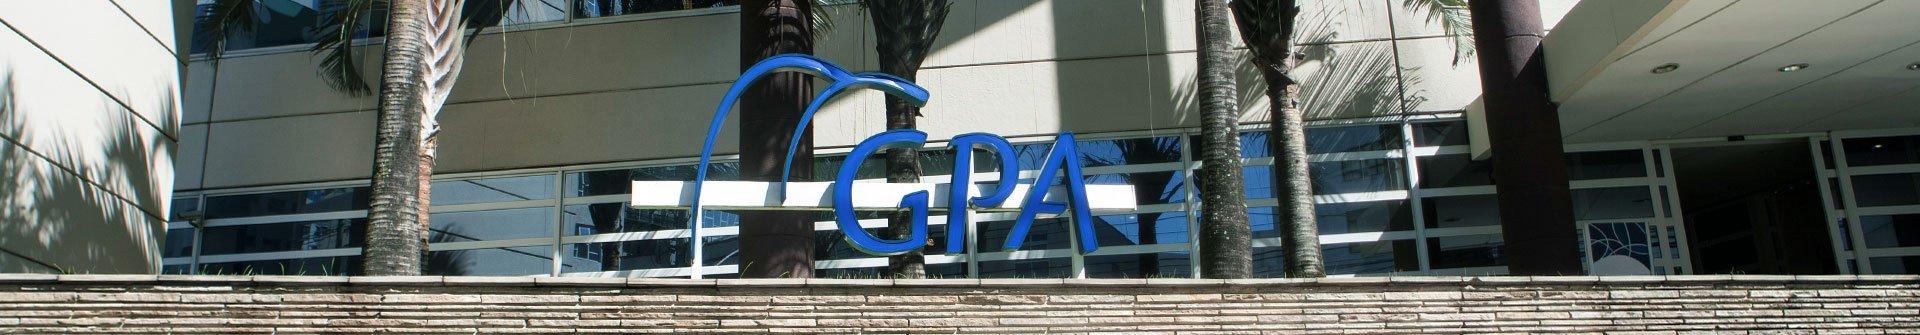 gpa_banner